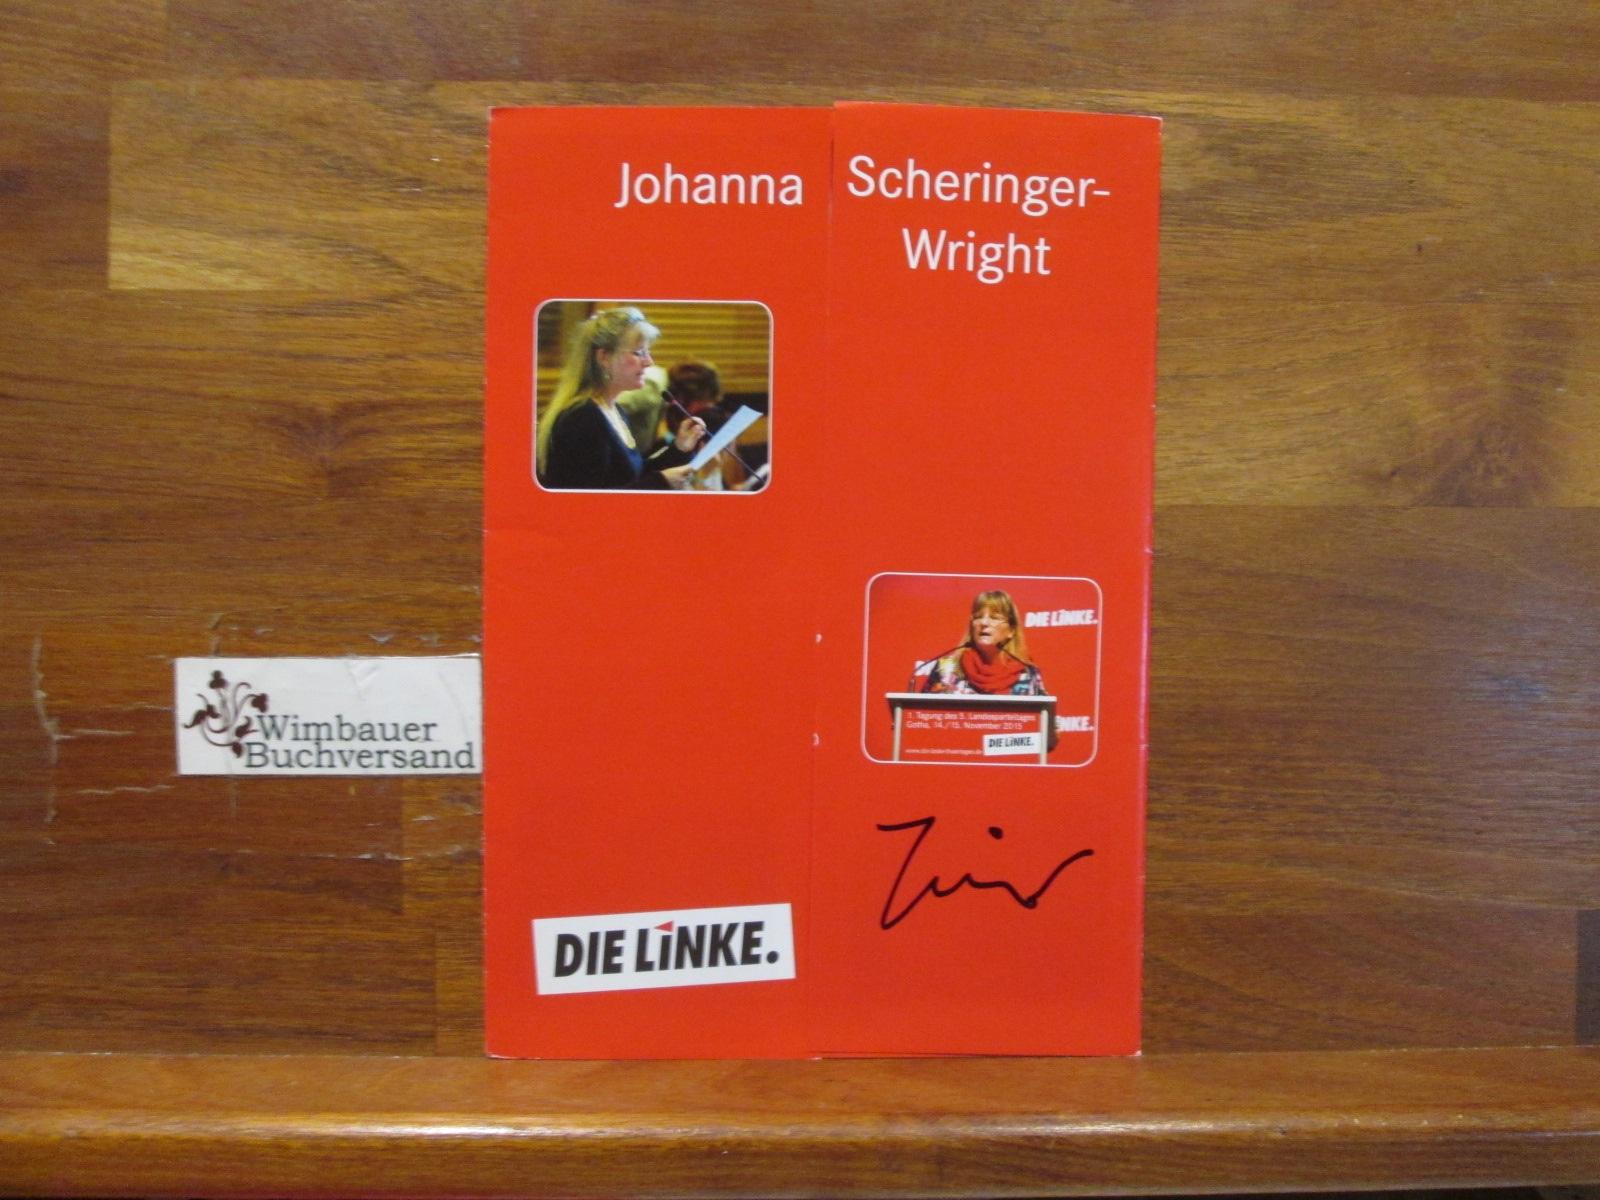 Original Autogramm Johanna Scheringer-Wright MdL Die Linke  /// Autogramm Autograph signiert signed signee